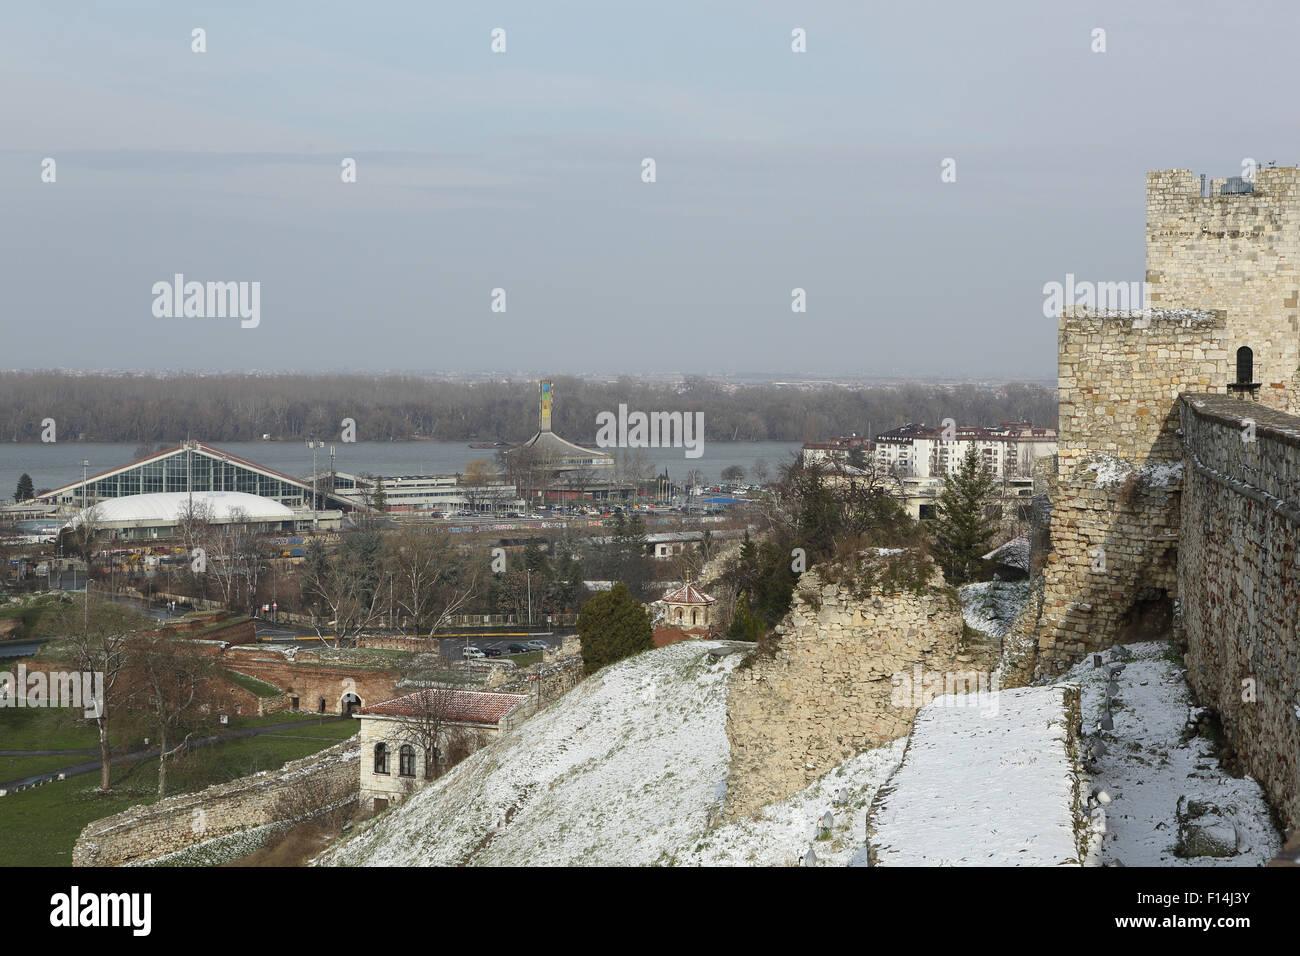 Kalemegdan Fortress in Belgrade, Serbia. The castle overlooks the River Danube. - Stock Image